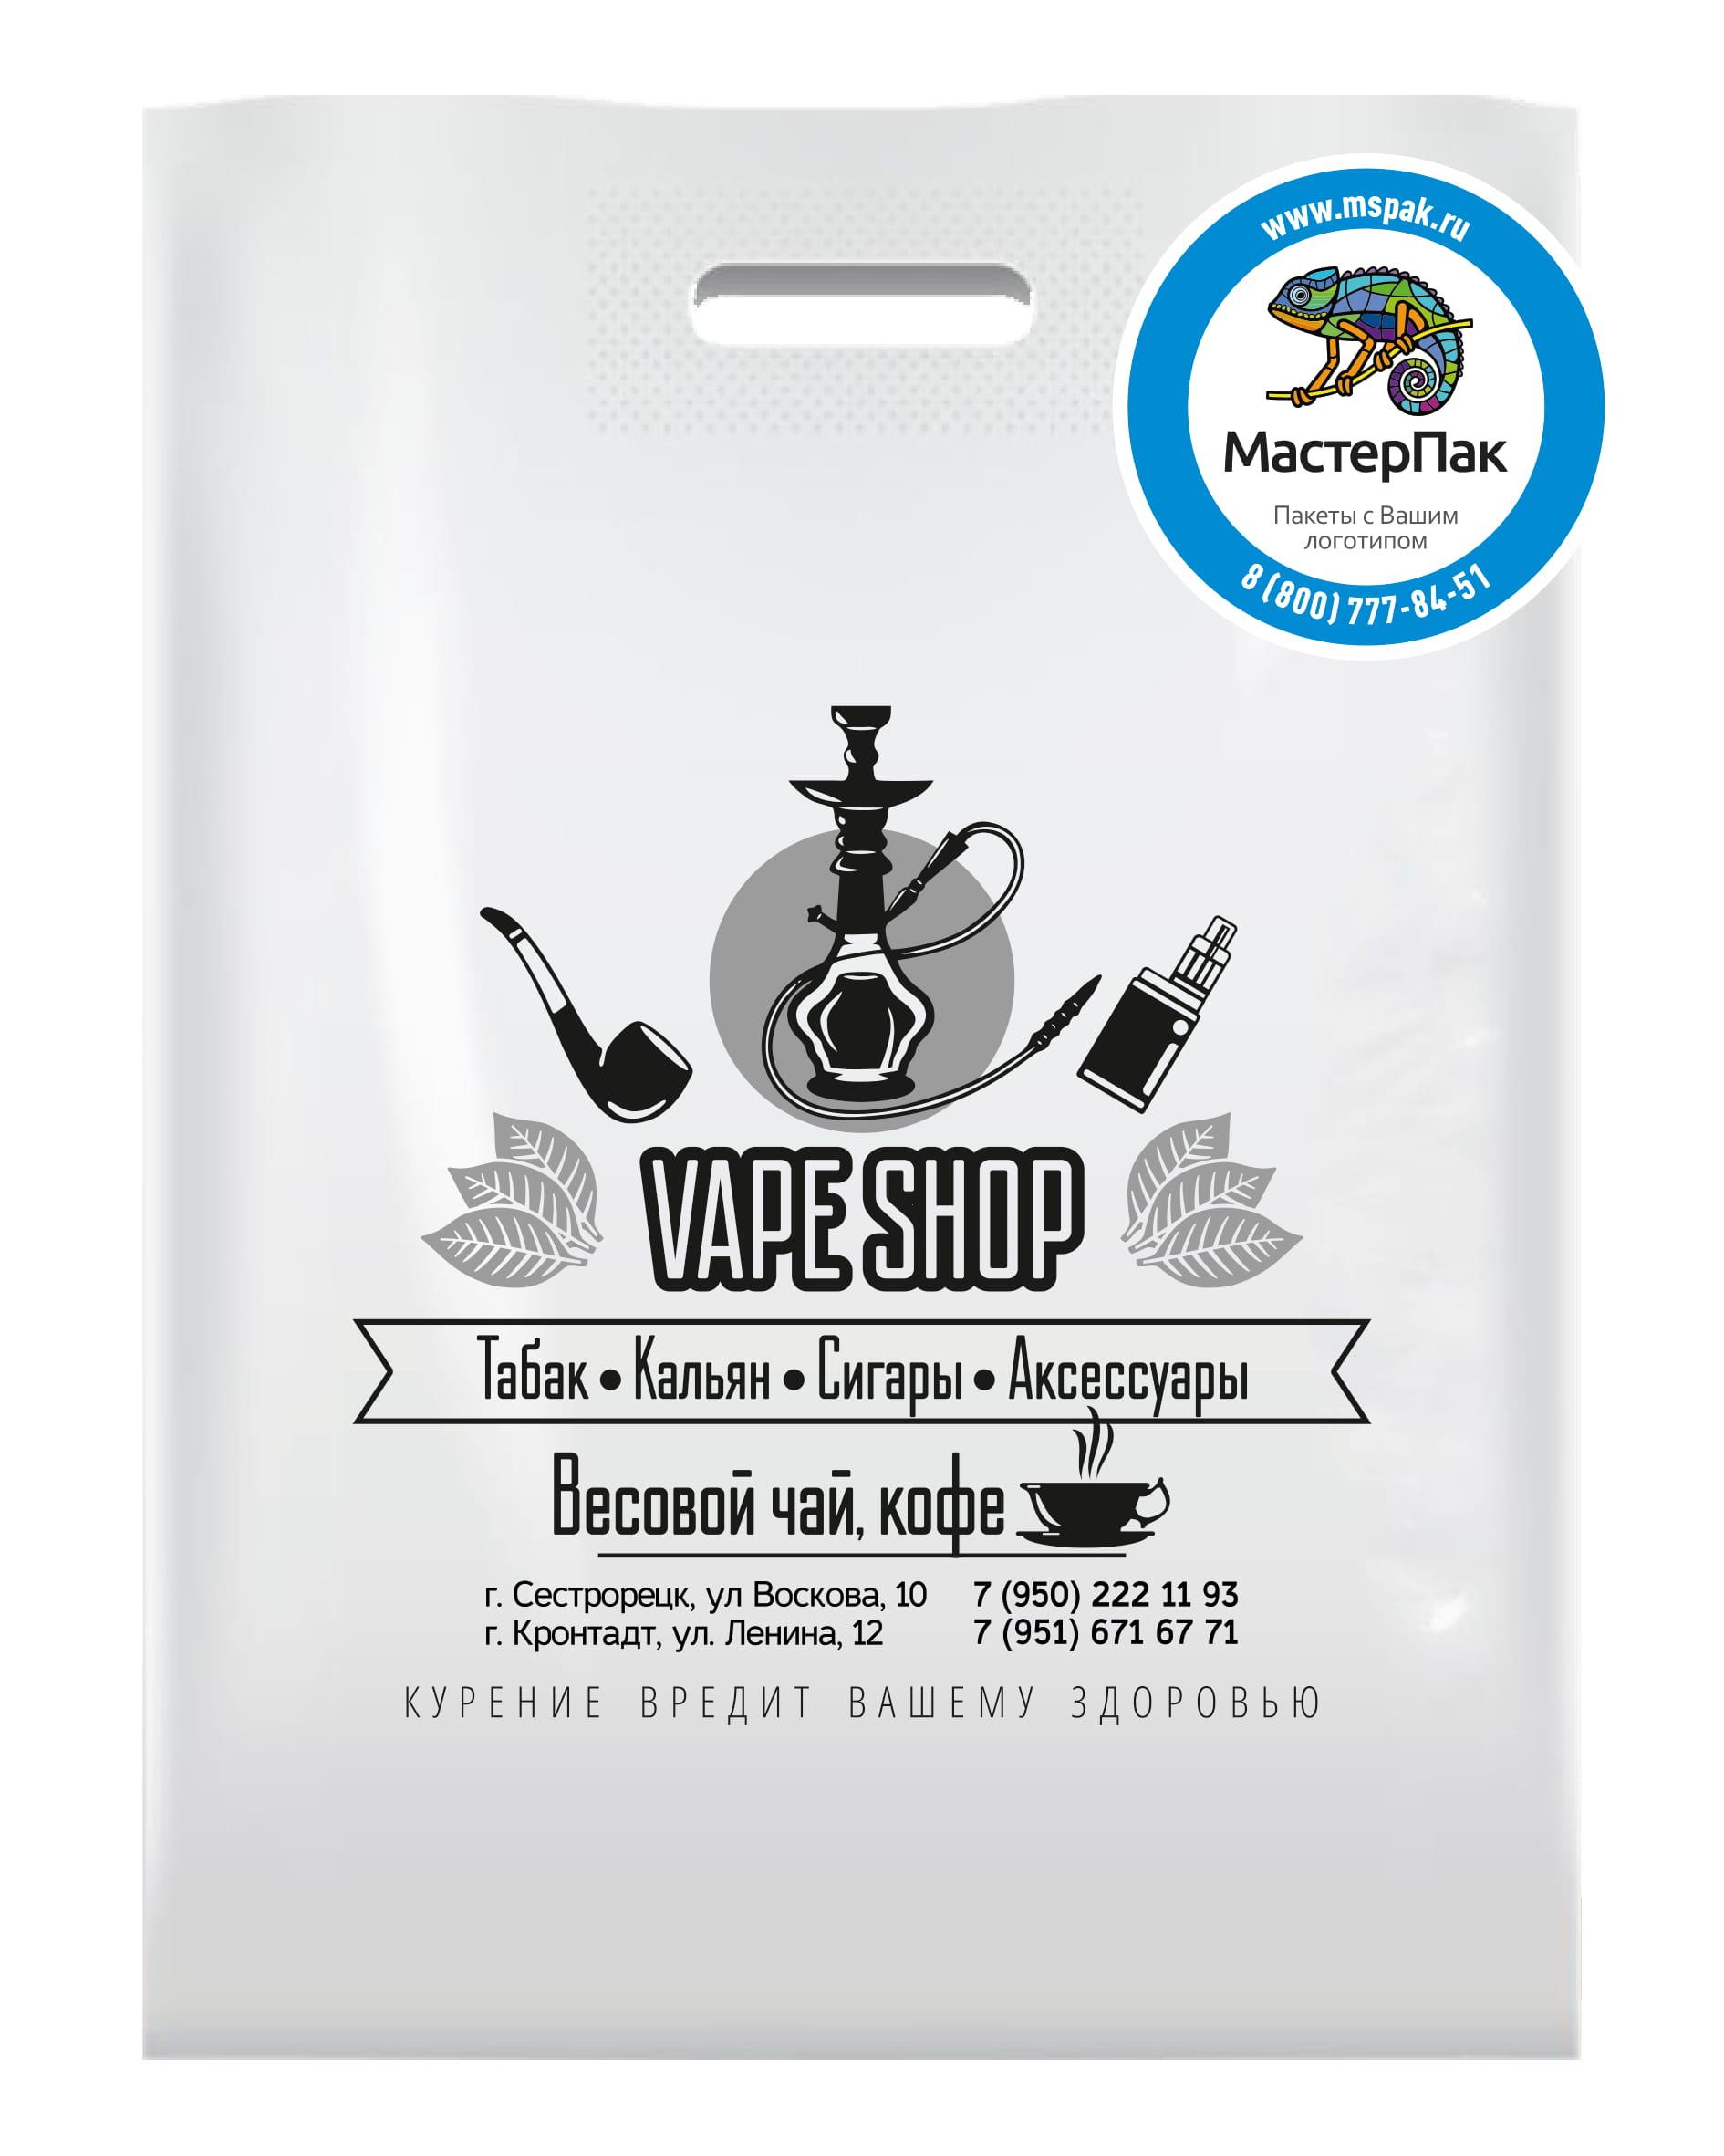 Пакет ПВД с логотипом магазина Vape shop, 70 мкм, 30*40